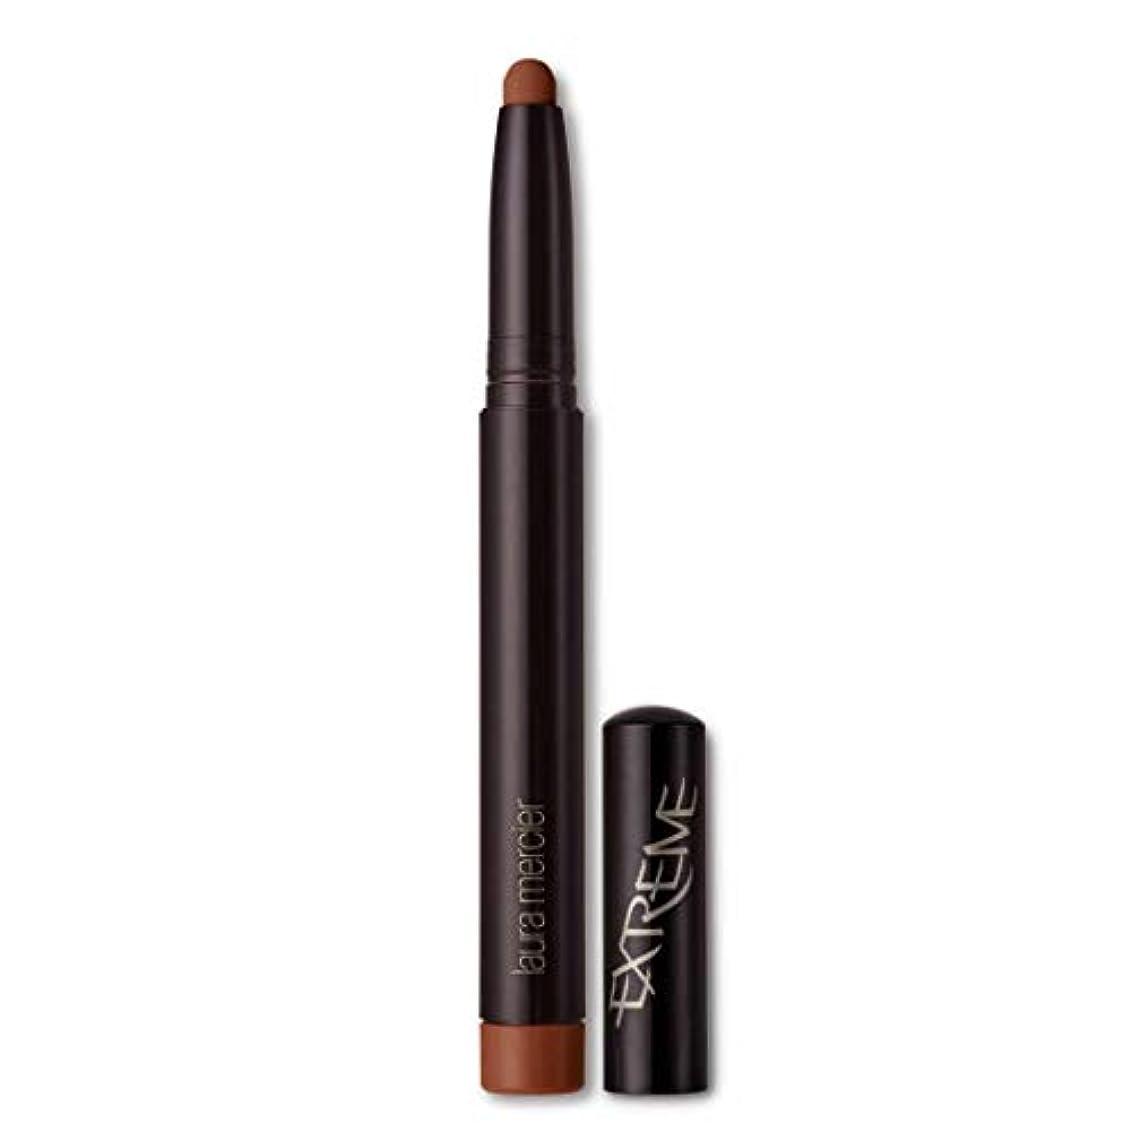 支配的騒乱出撃者Laura Mercier Velour Intense Pigment Rich Colour Extreme Matte Lipstick - Rock